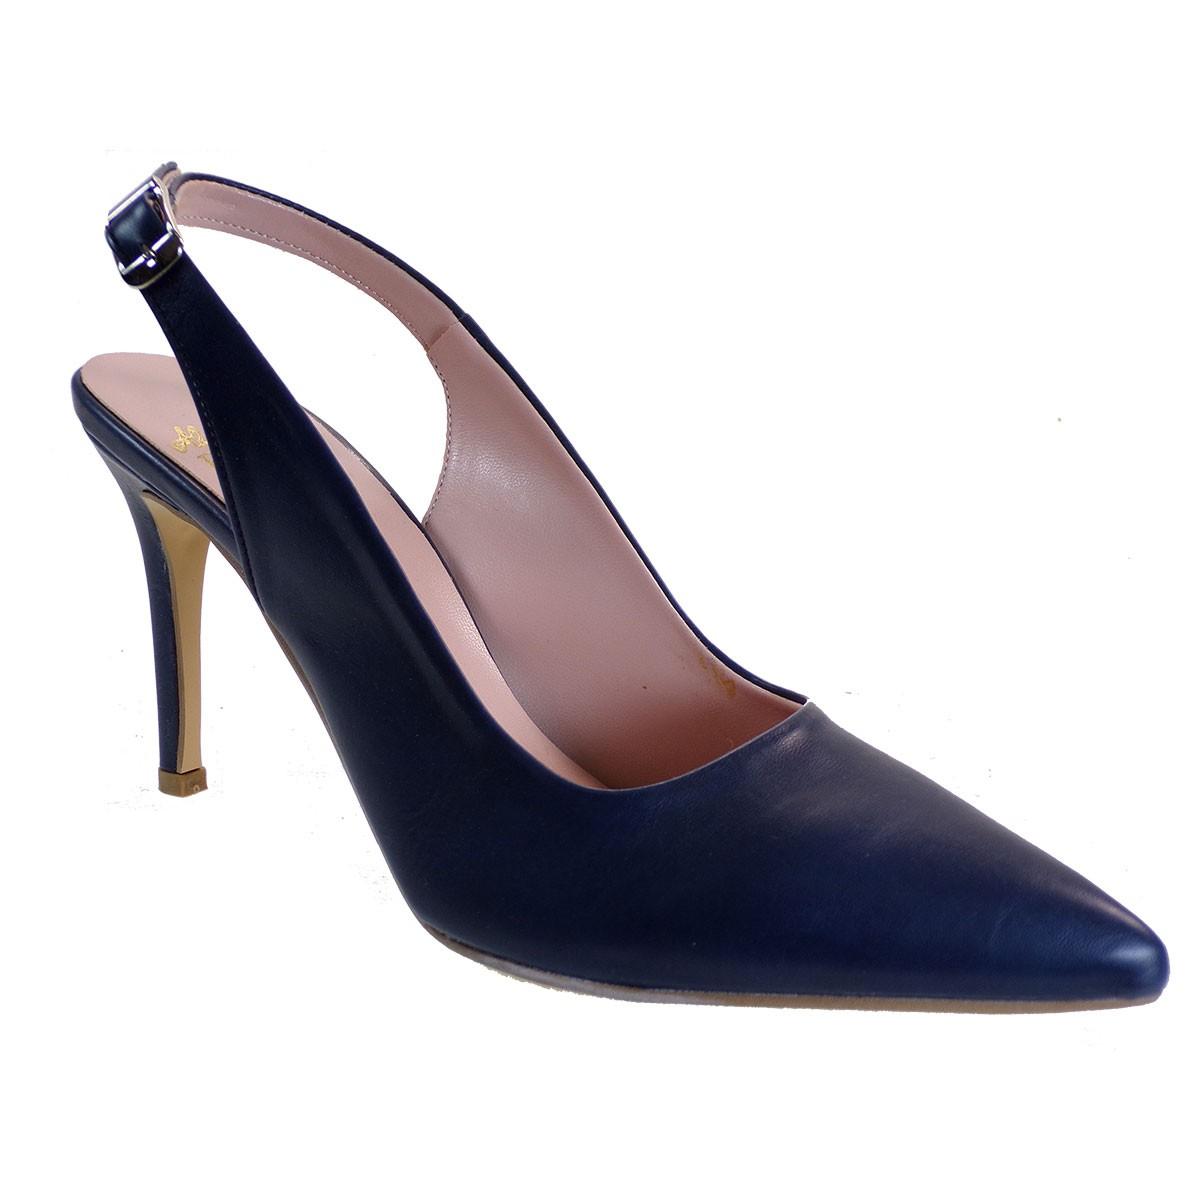 Alessandra Paggioti Γυναικεία Παπούτσια Γόβες 81000 Μπλε Σκούρο Ματ